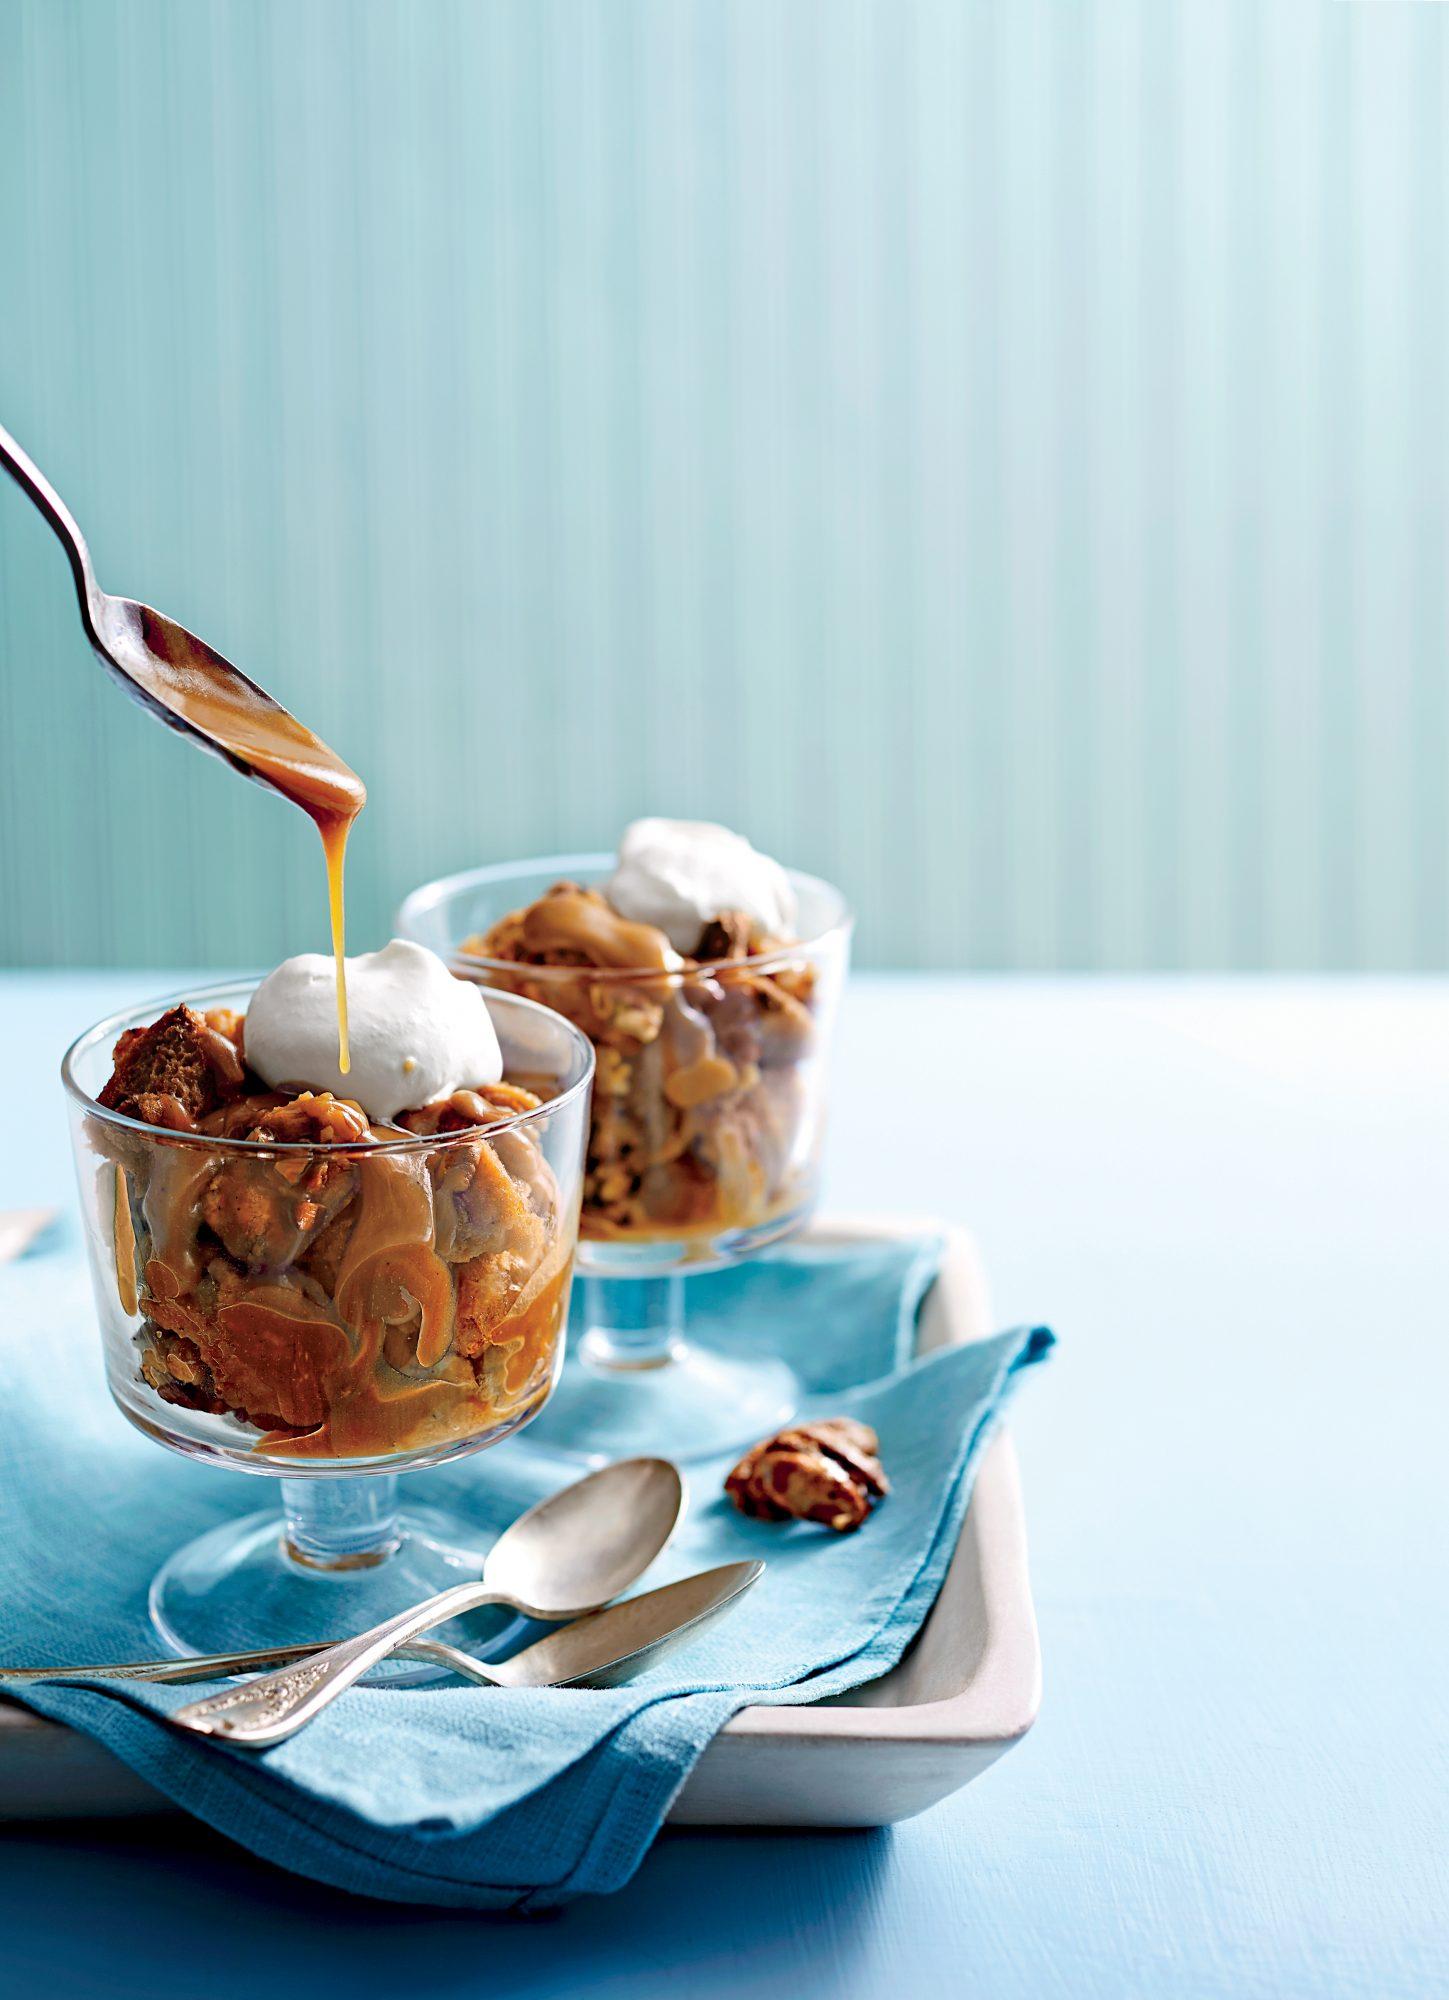 Praline Bread Pudding